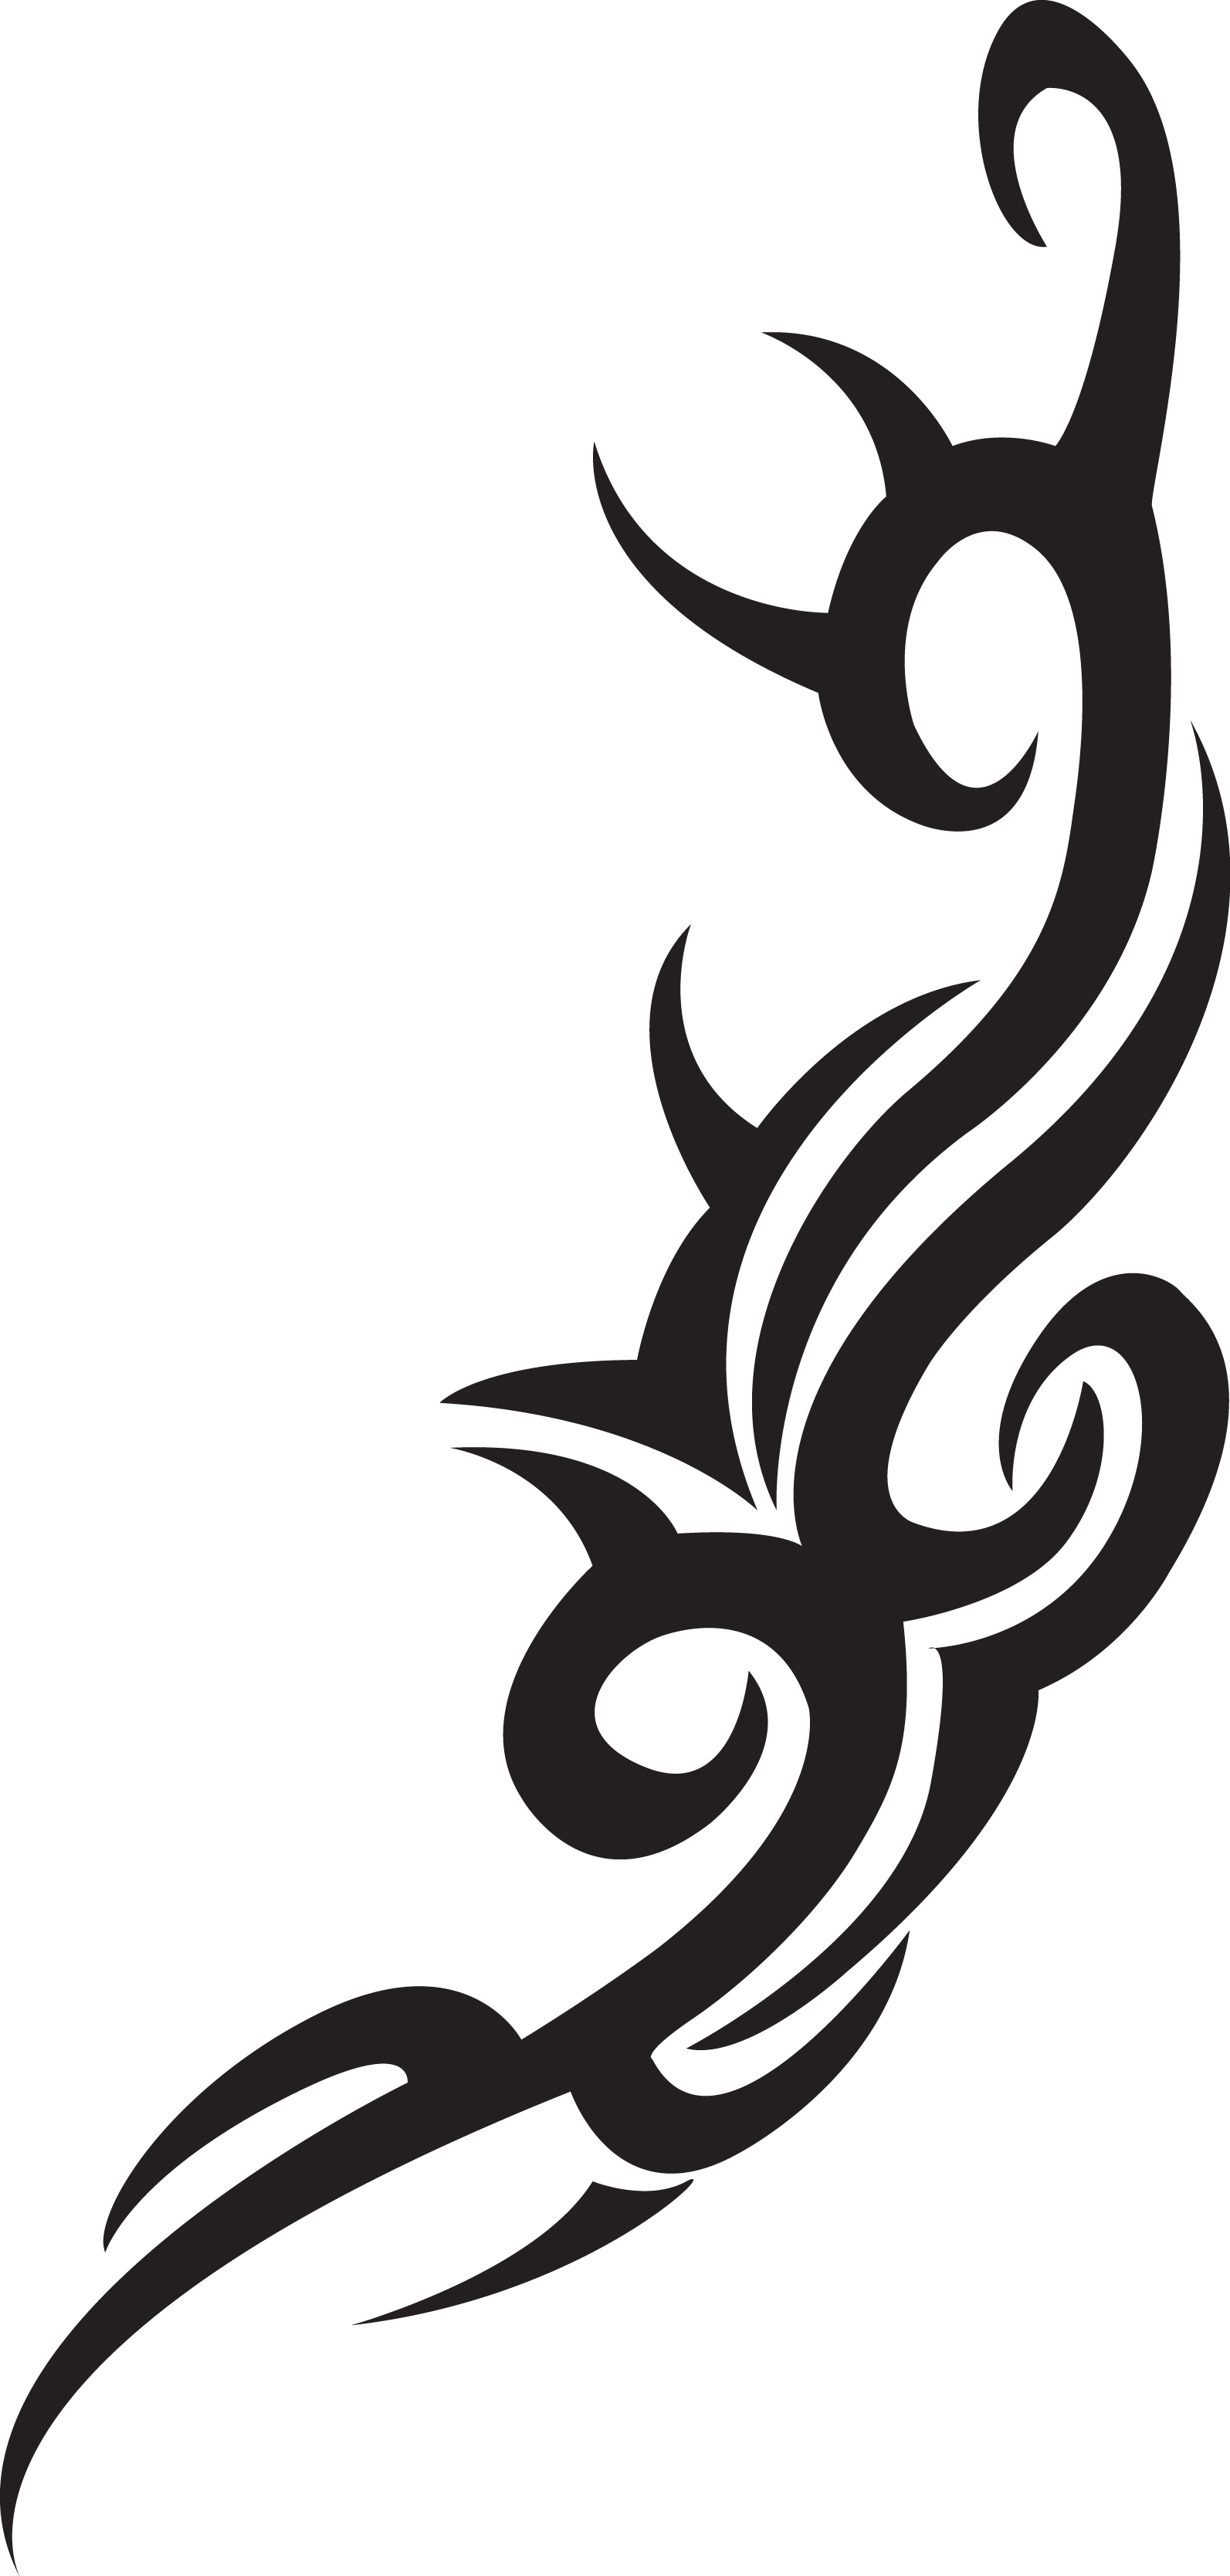 Jynx Maze S Tattoo By Walesrallyart On Deviantart